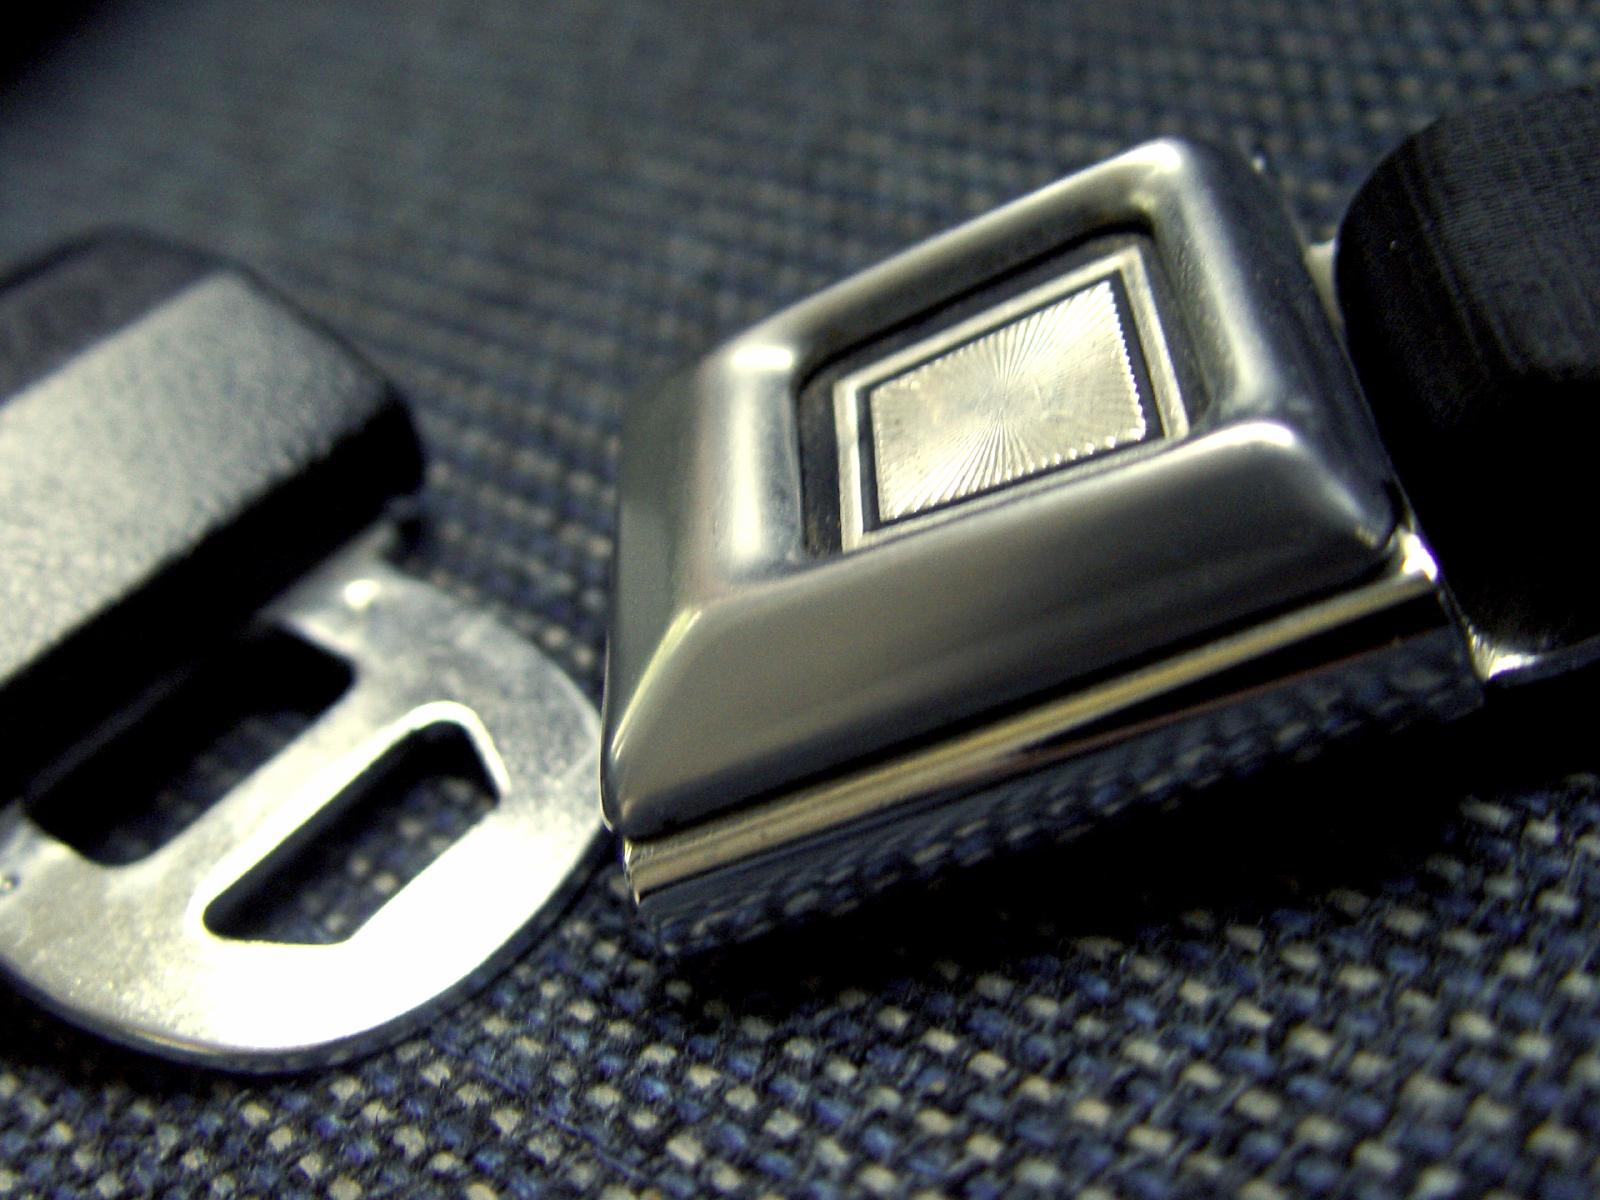 Seat Belts Save Lives Essay - Part 2